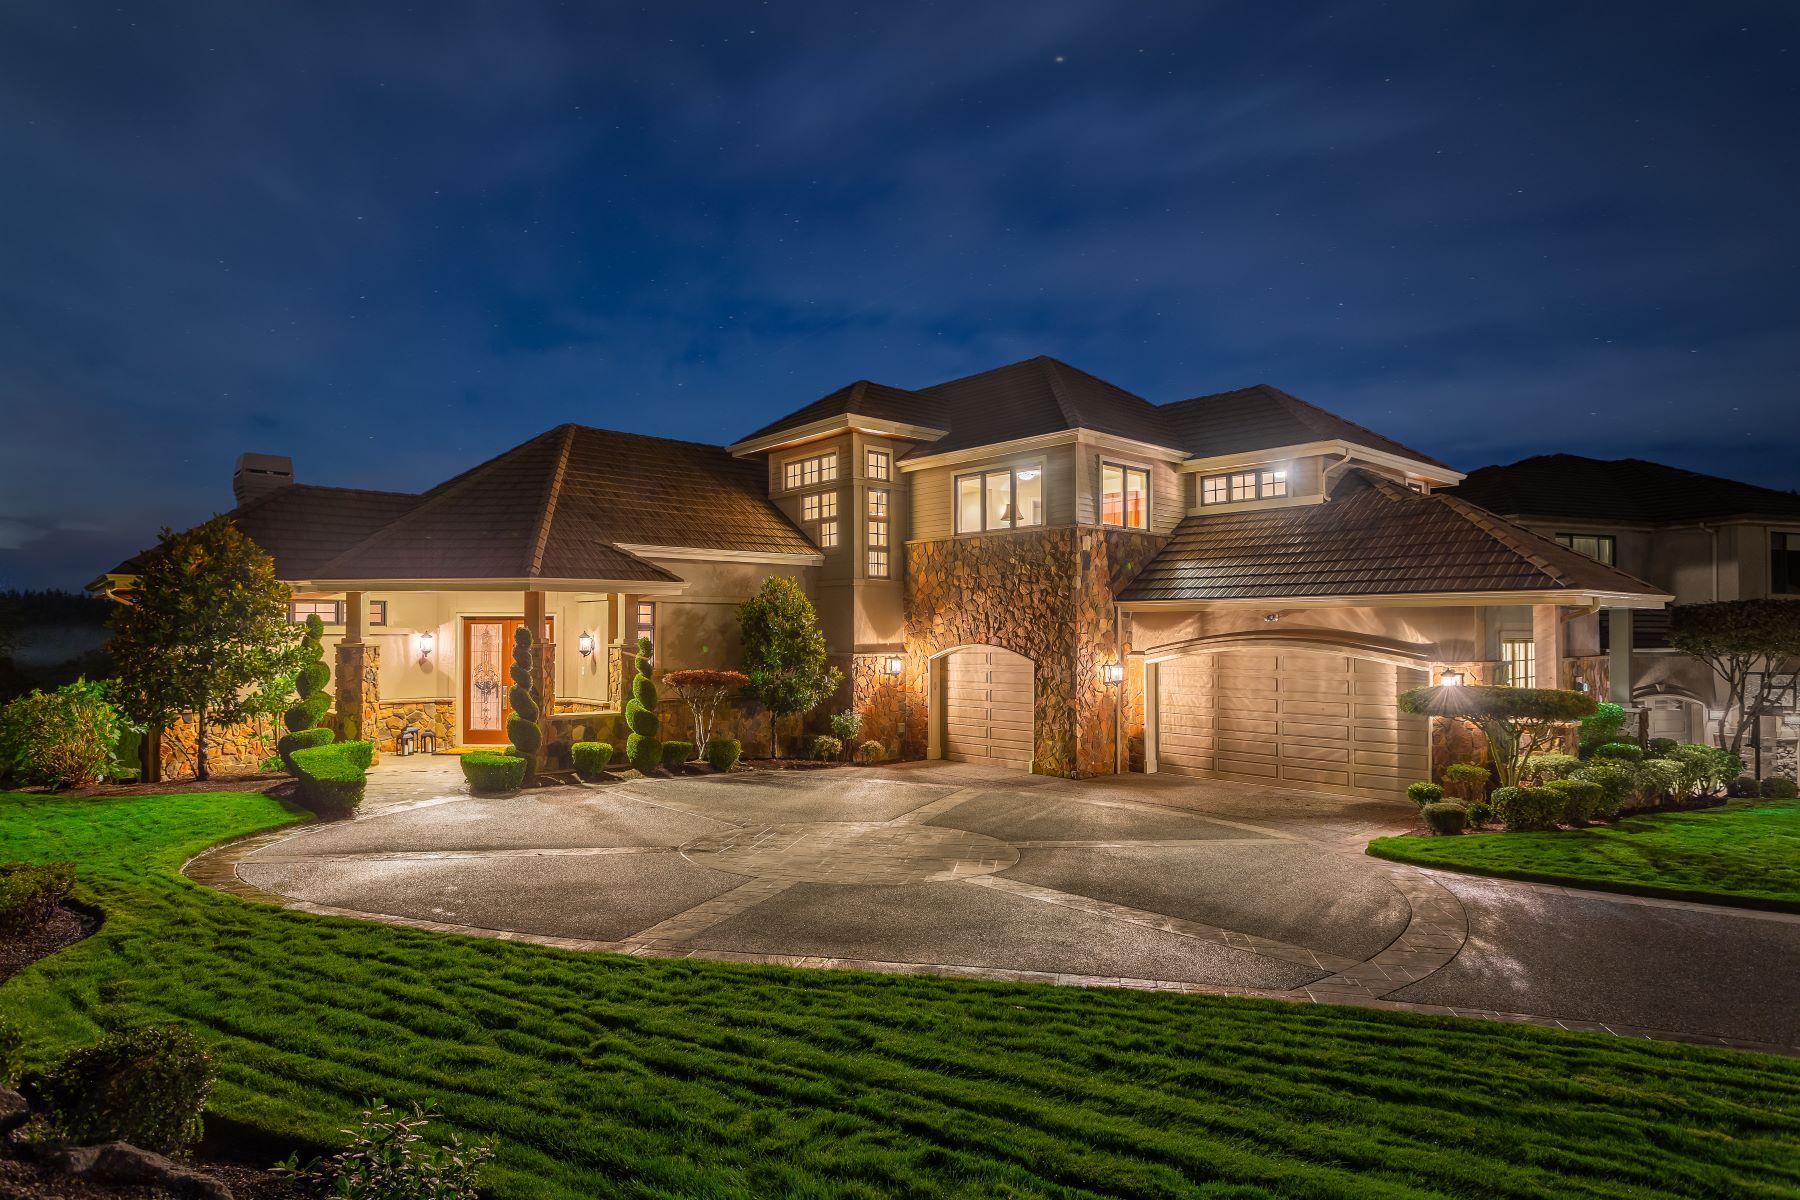 Single Family Homes for Sale at 15612 Southeast 83rd Street, Newcastle, WA 98059 15612 SE 83rd Ct Newcastle, Washington 98059 United States